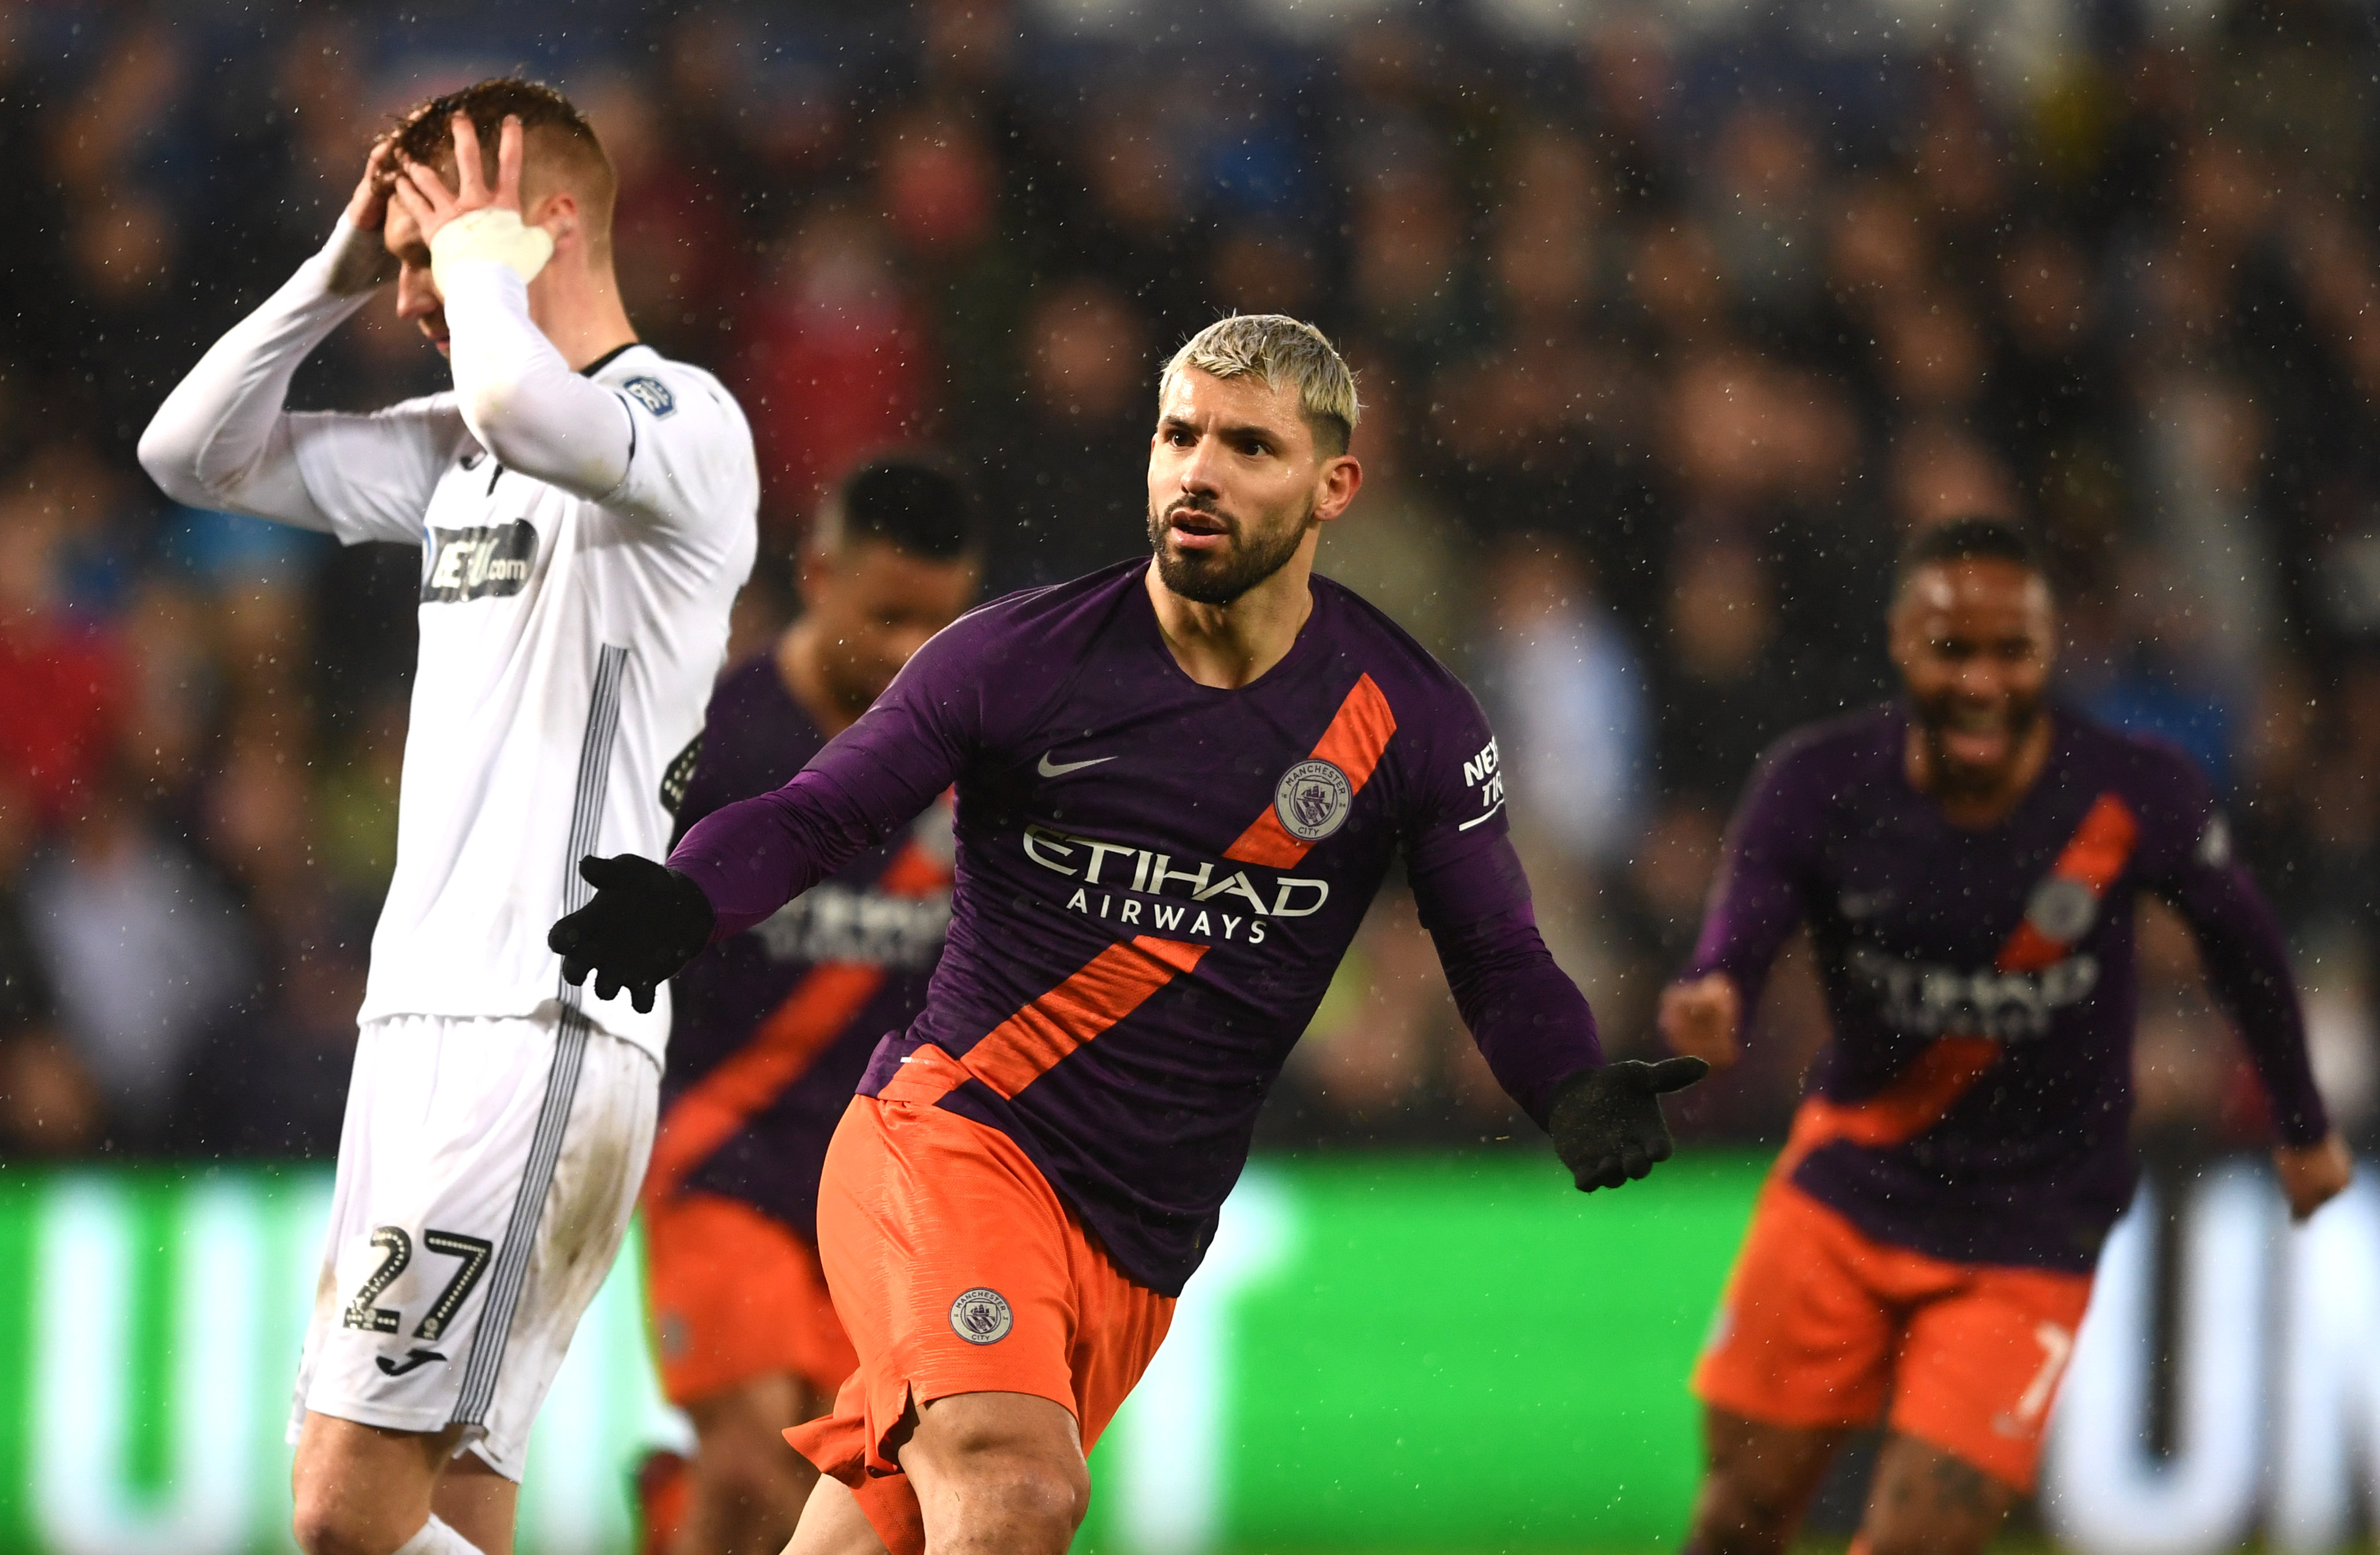 Swansea City v Manchester City - FA Cup Quarter Final